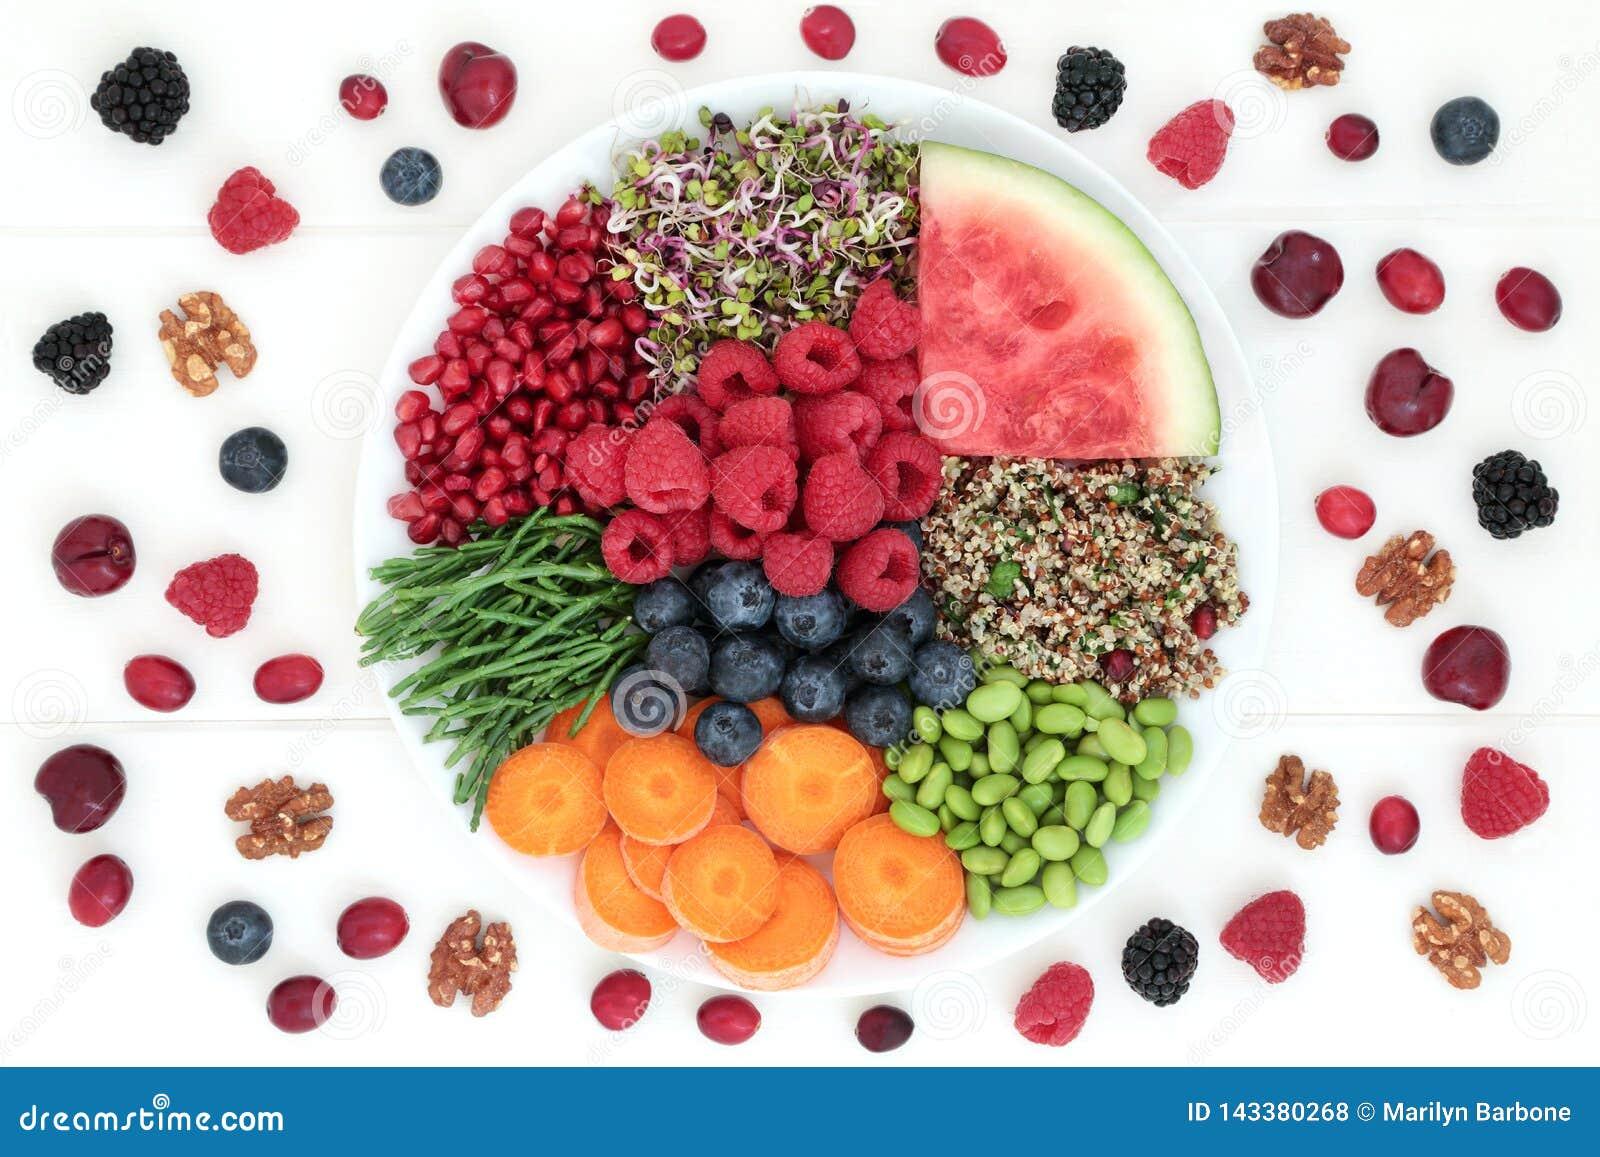 Healthy Fresh Superfood